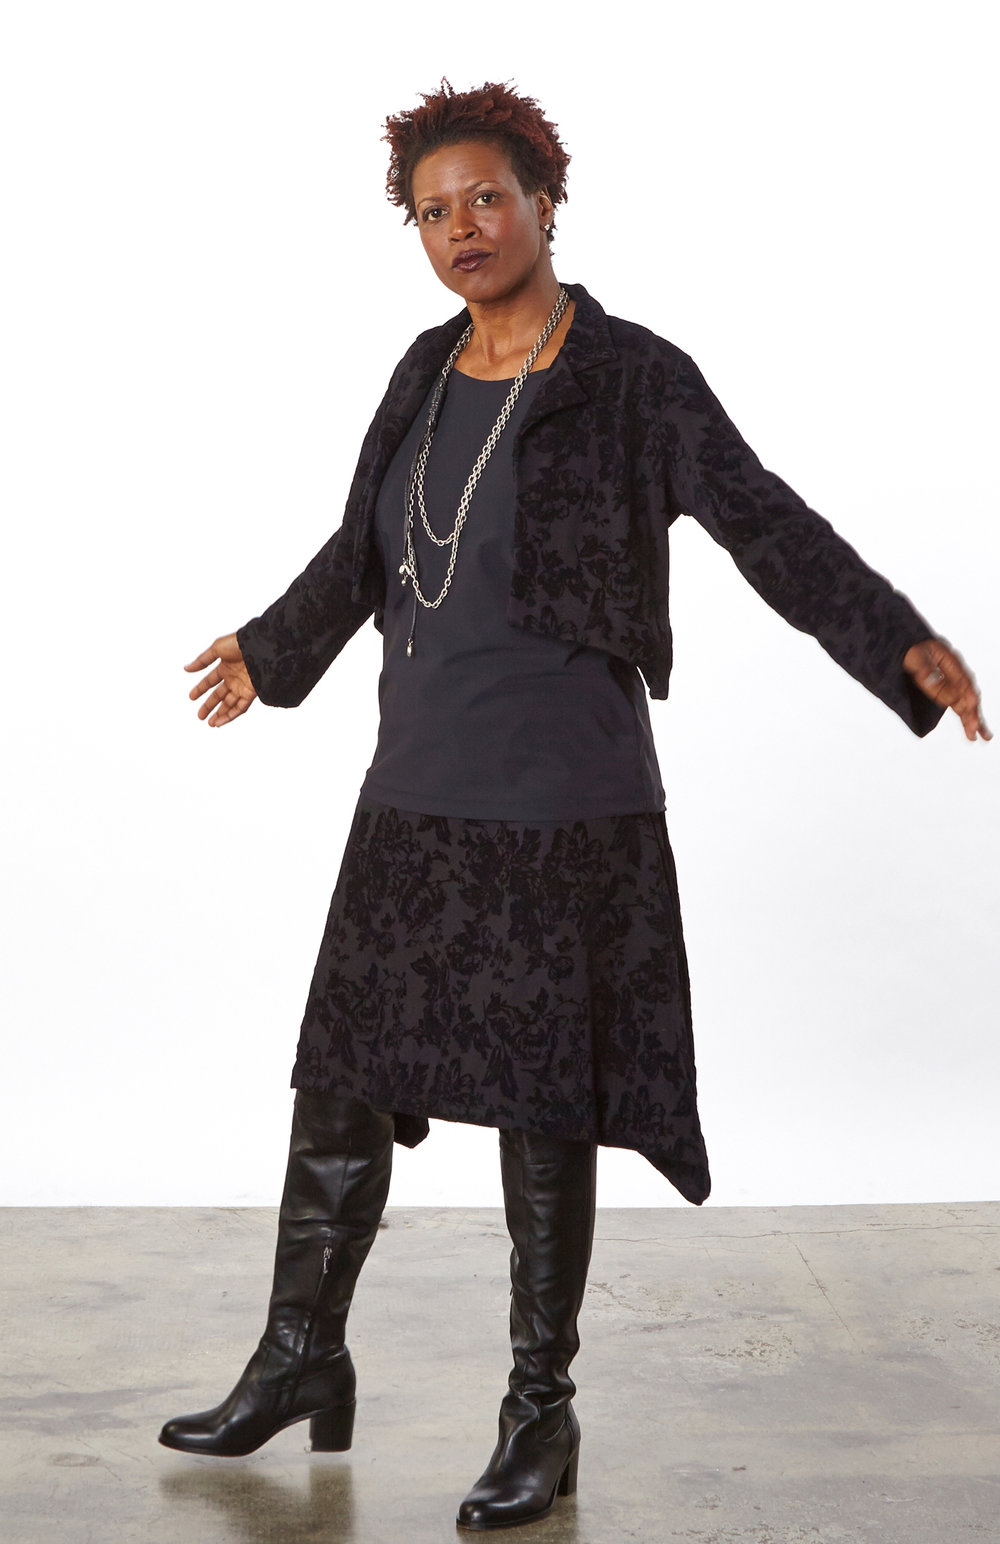 Hathaway Jacket, Sean Skirt in Black Italian Fiore Floccato